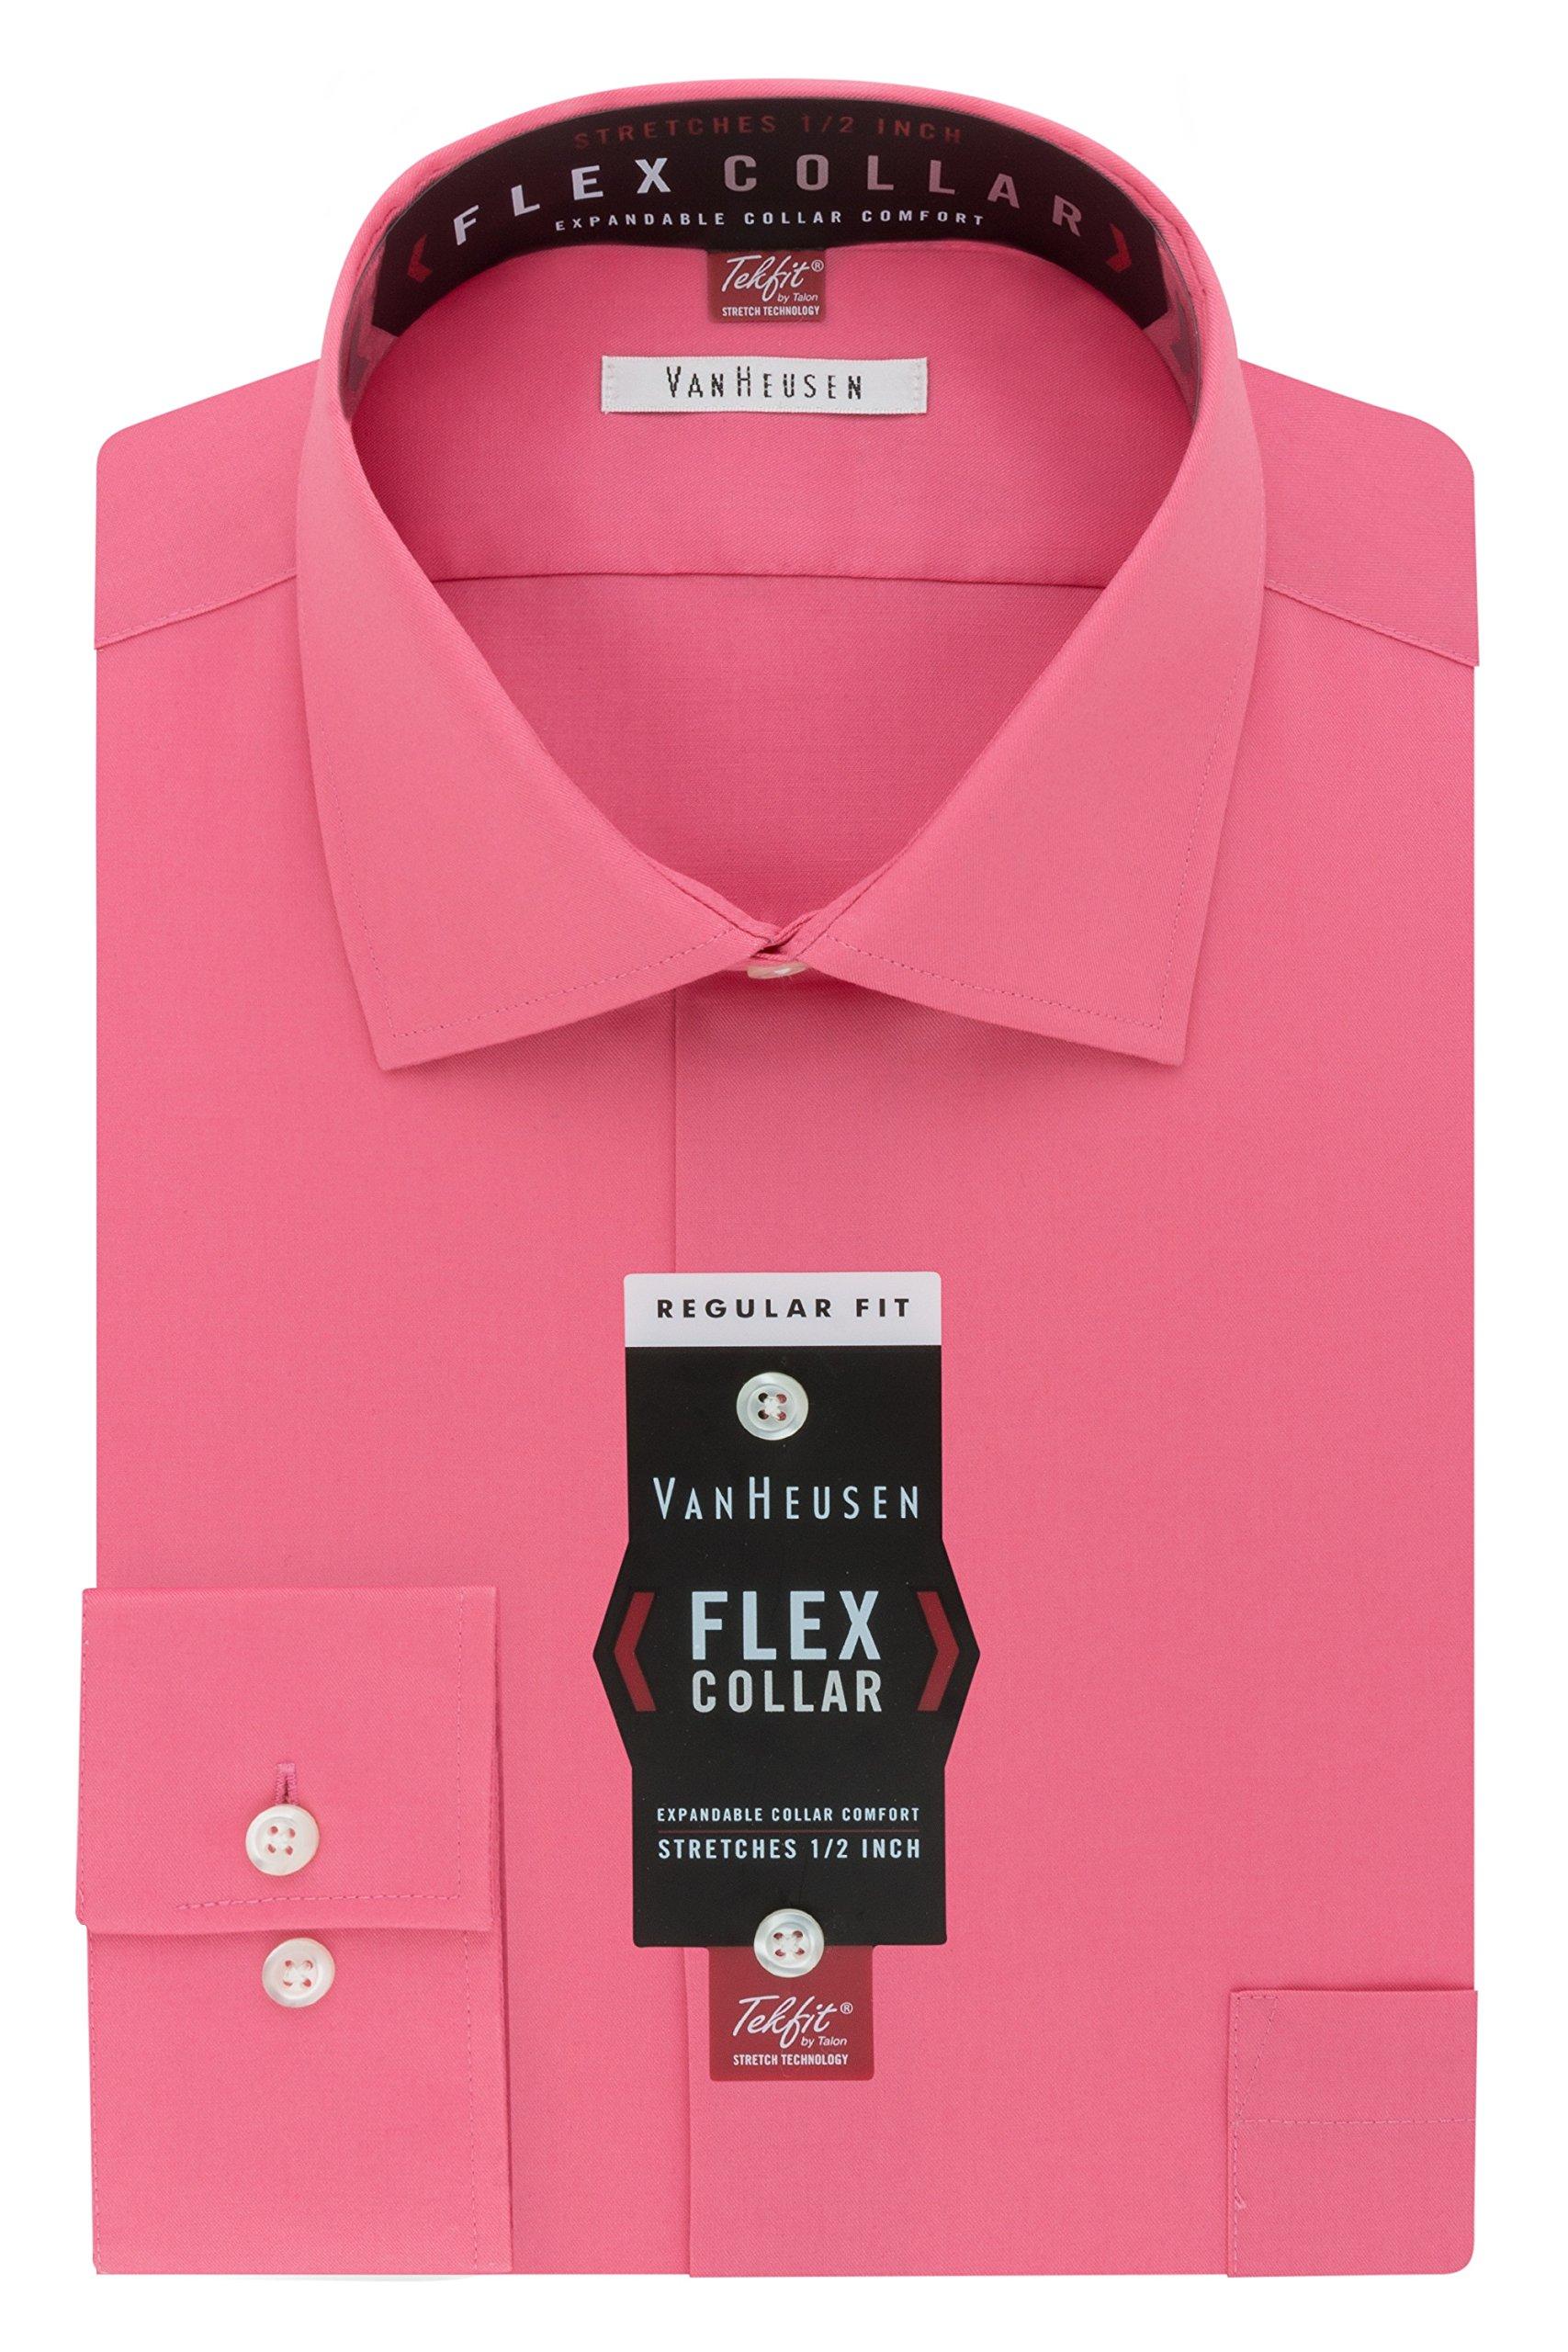 Van Heusen Men's Flex Collar Regular Fit Solid Spread Collar Dress Shirt, English Rose, 17.5'' Neck 34''-35'' Sleeve